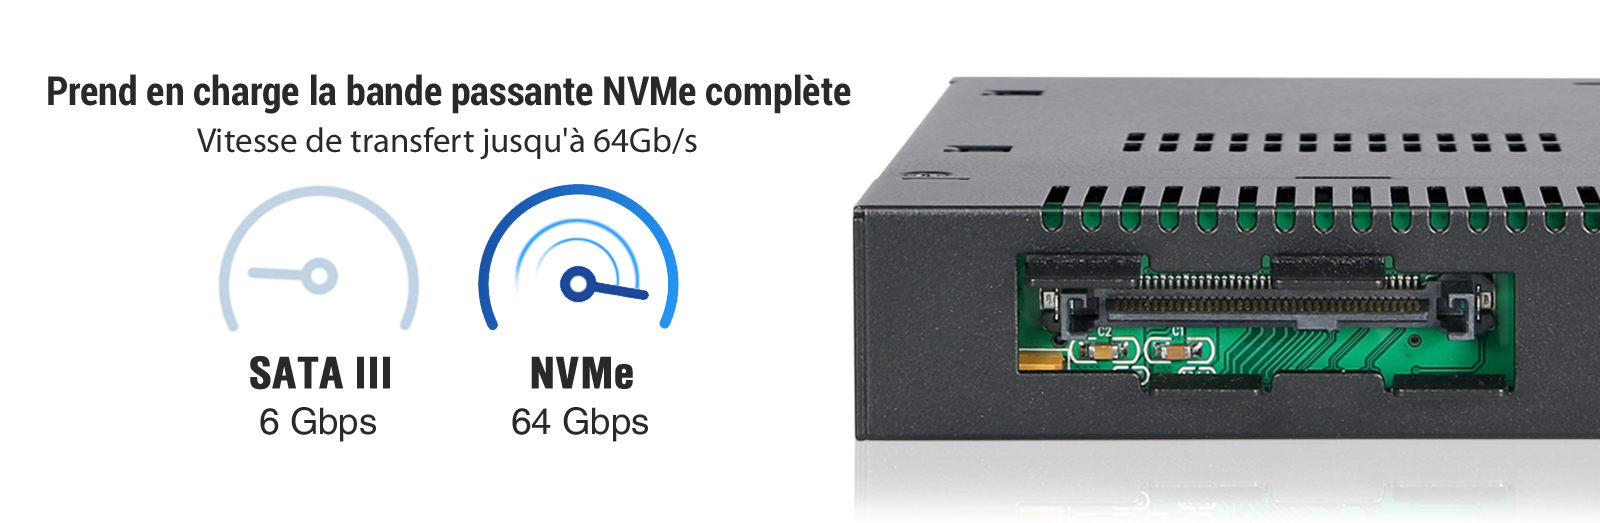 Comparaison NVMe VS SATA